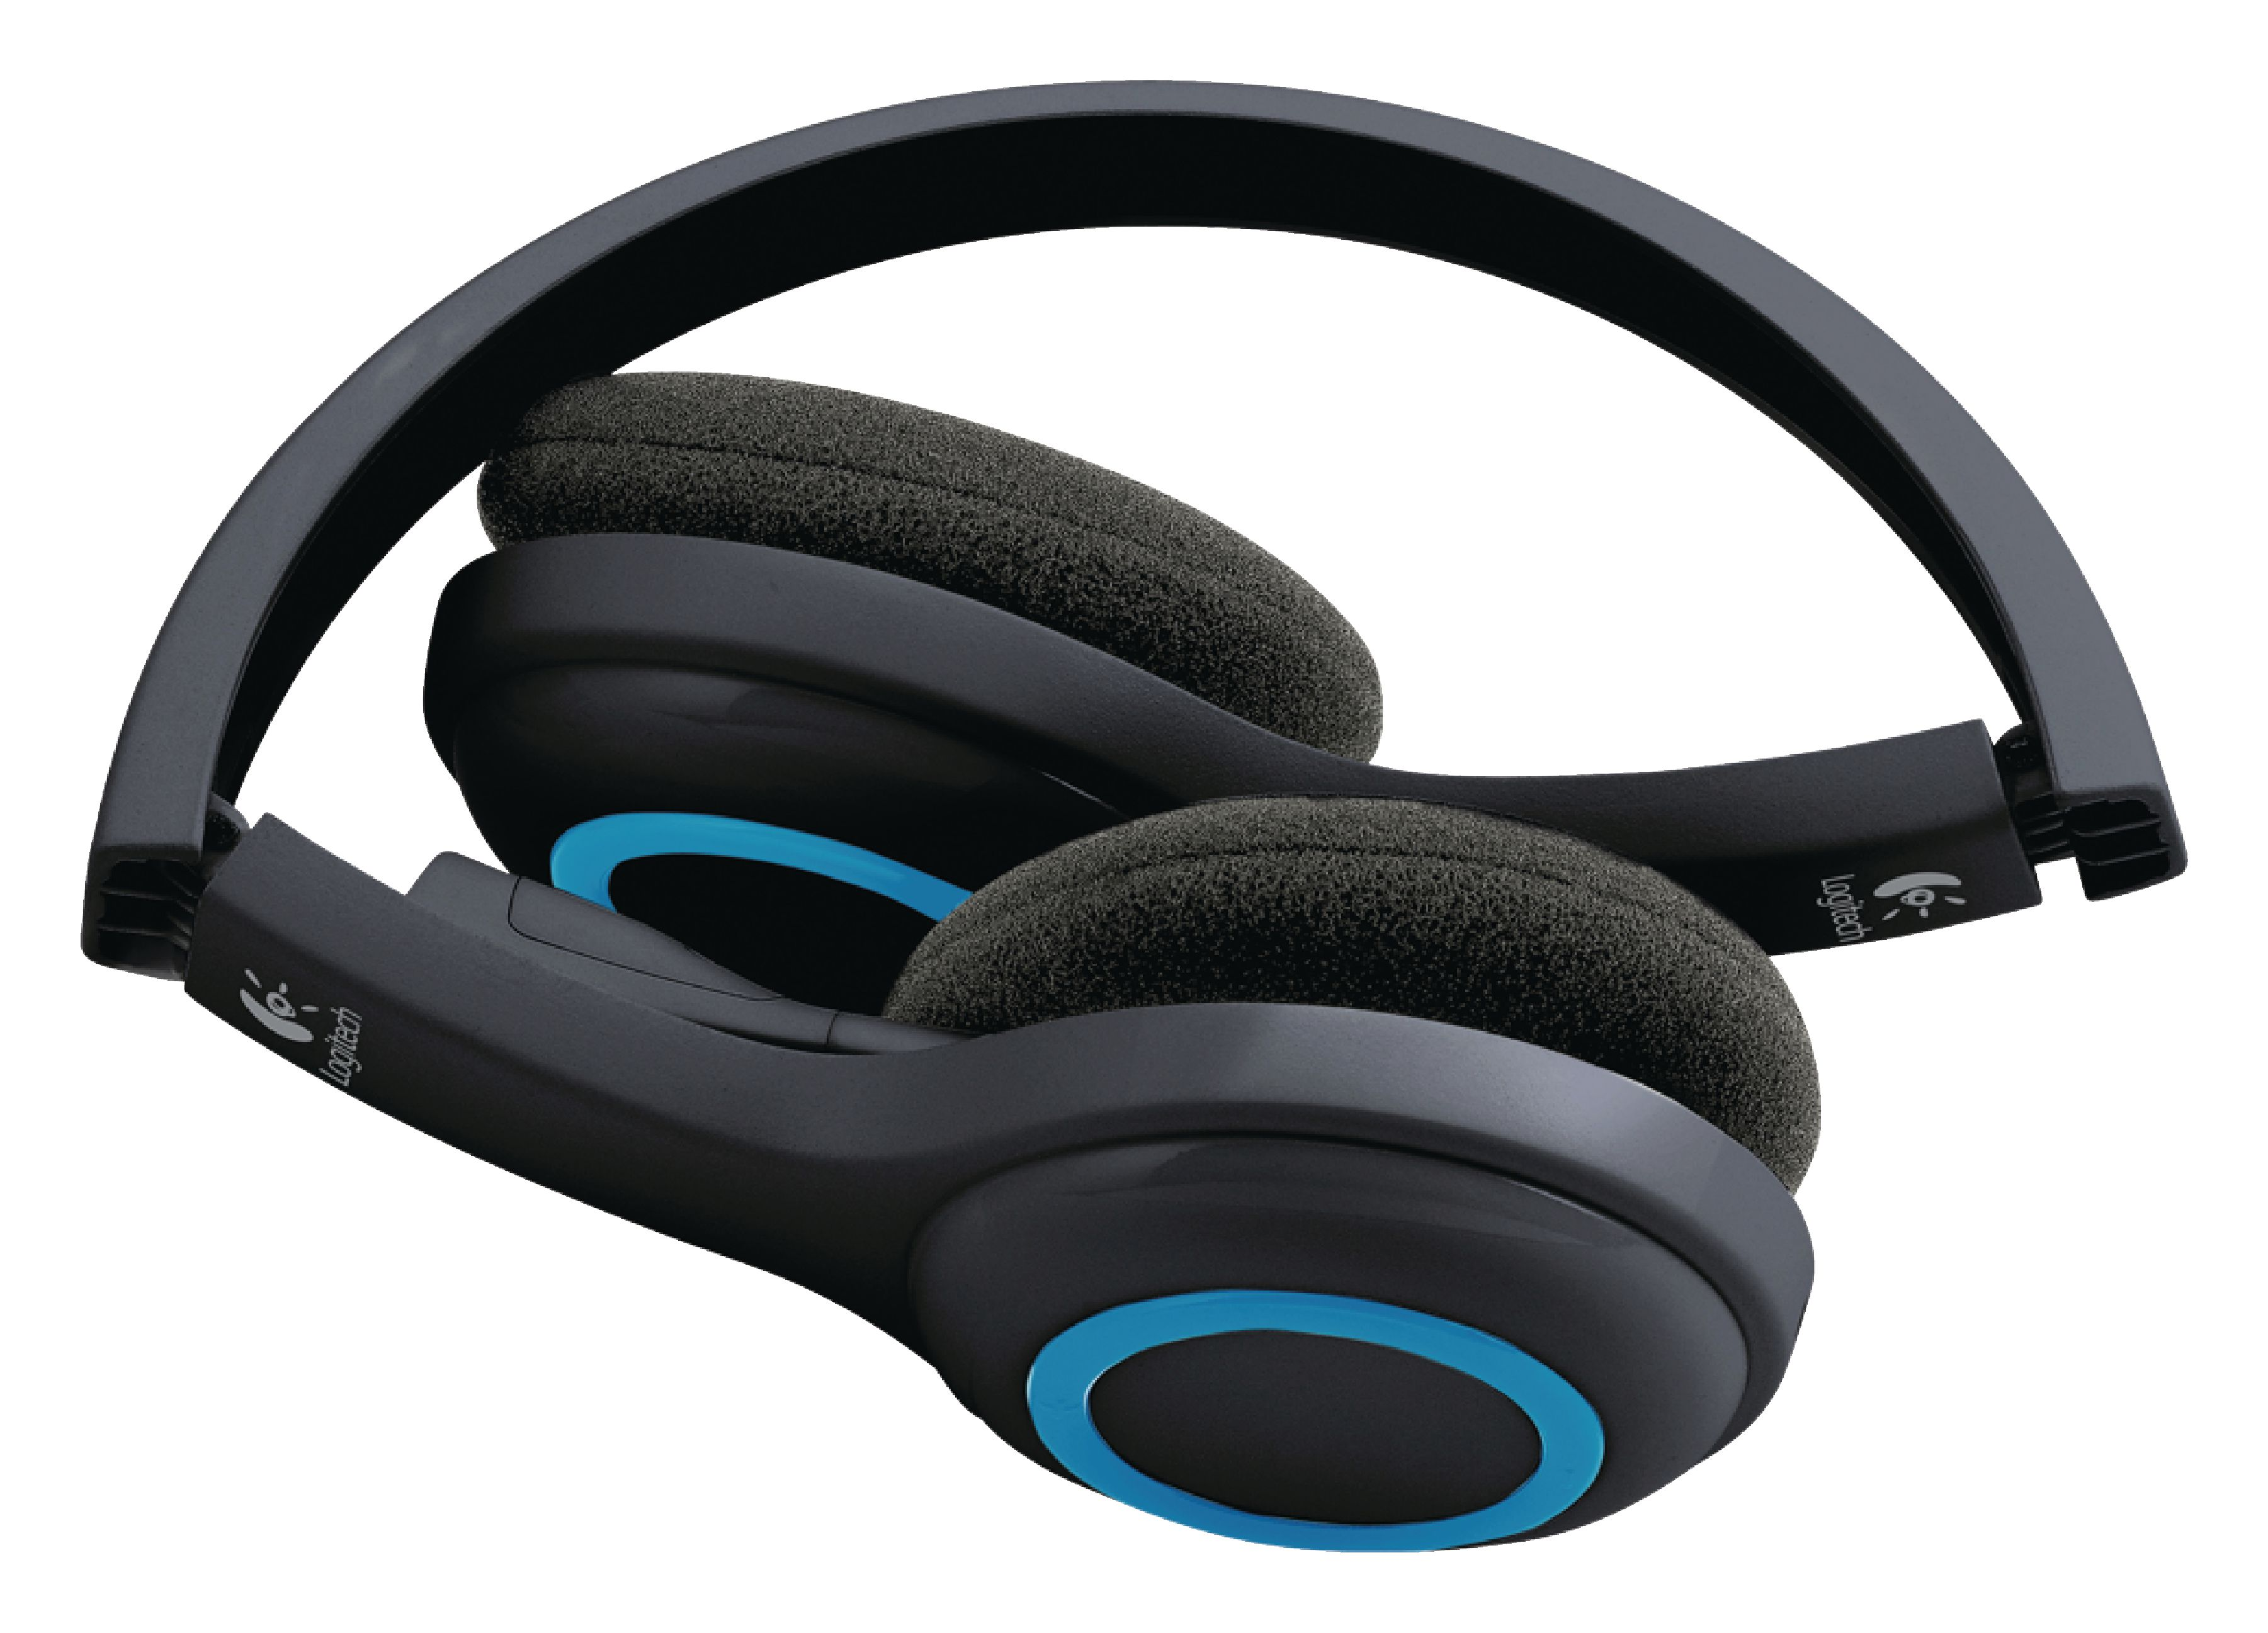 Headset ANC (Active Noise Cancelling) Sammenleggbar Pa